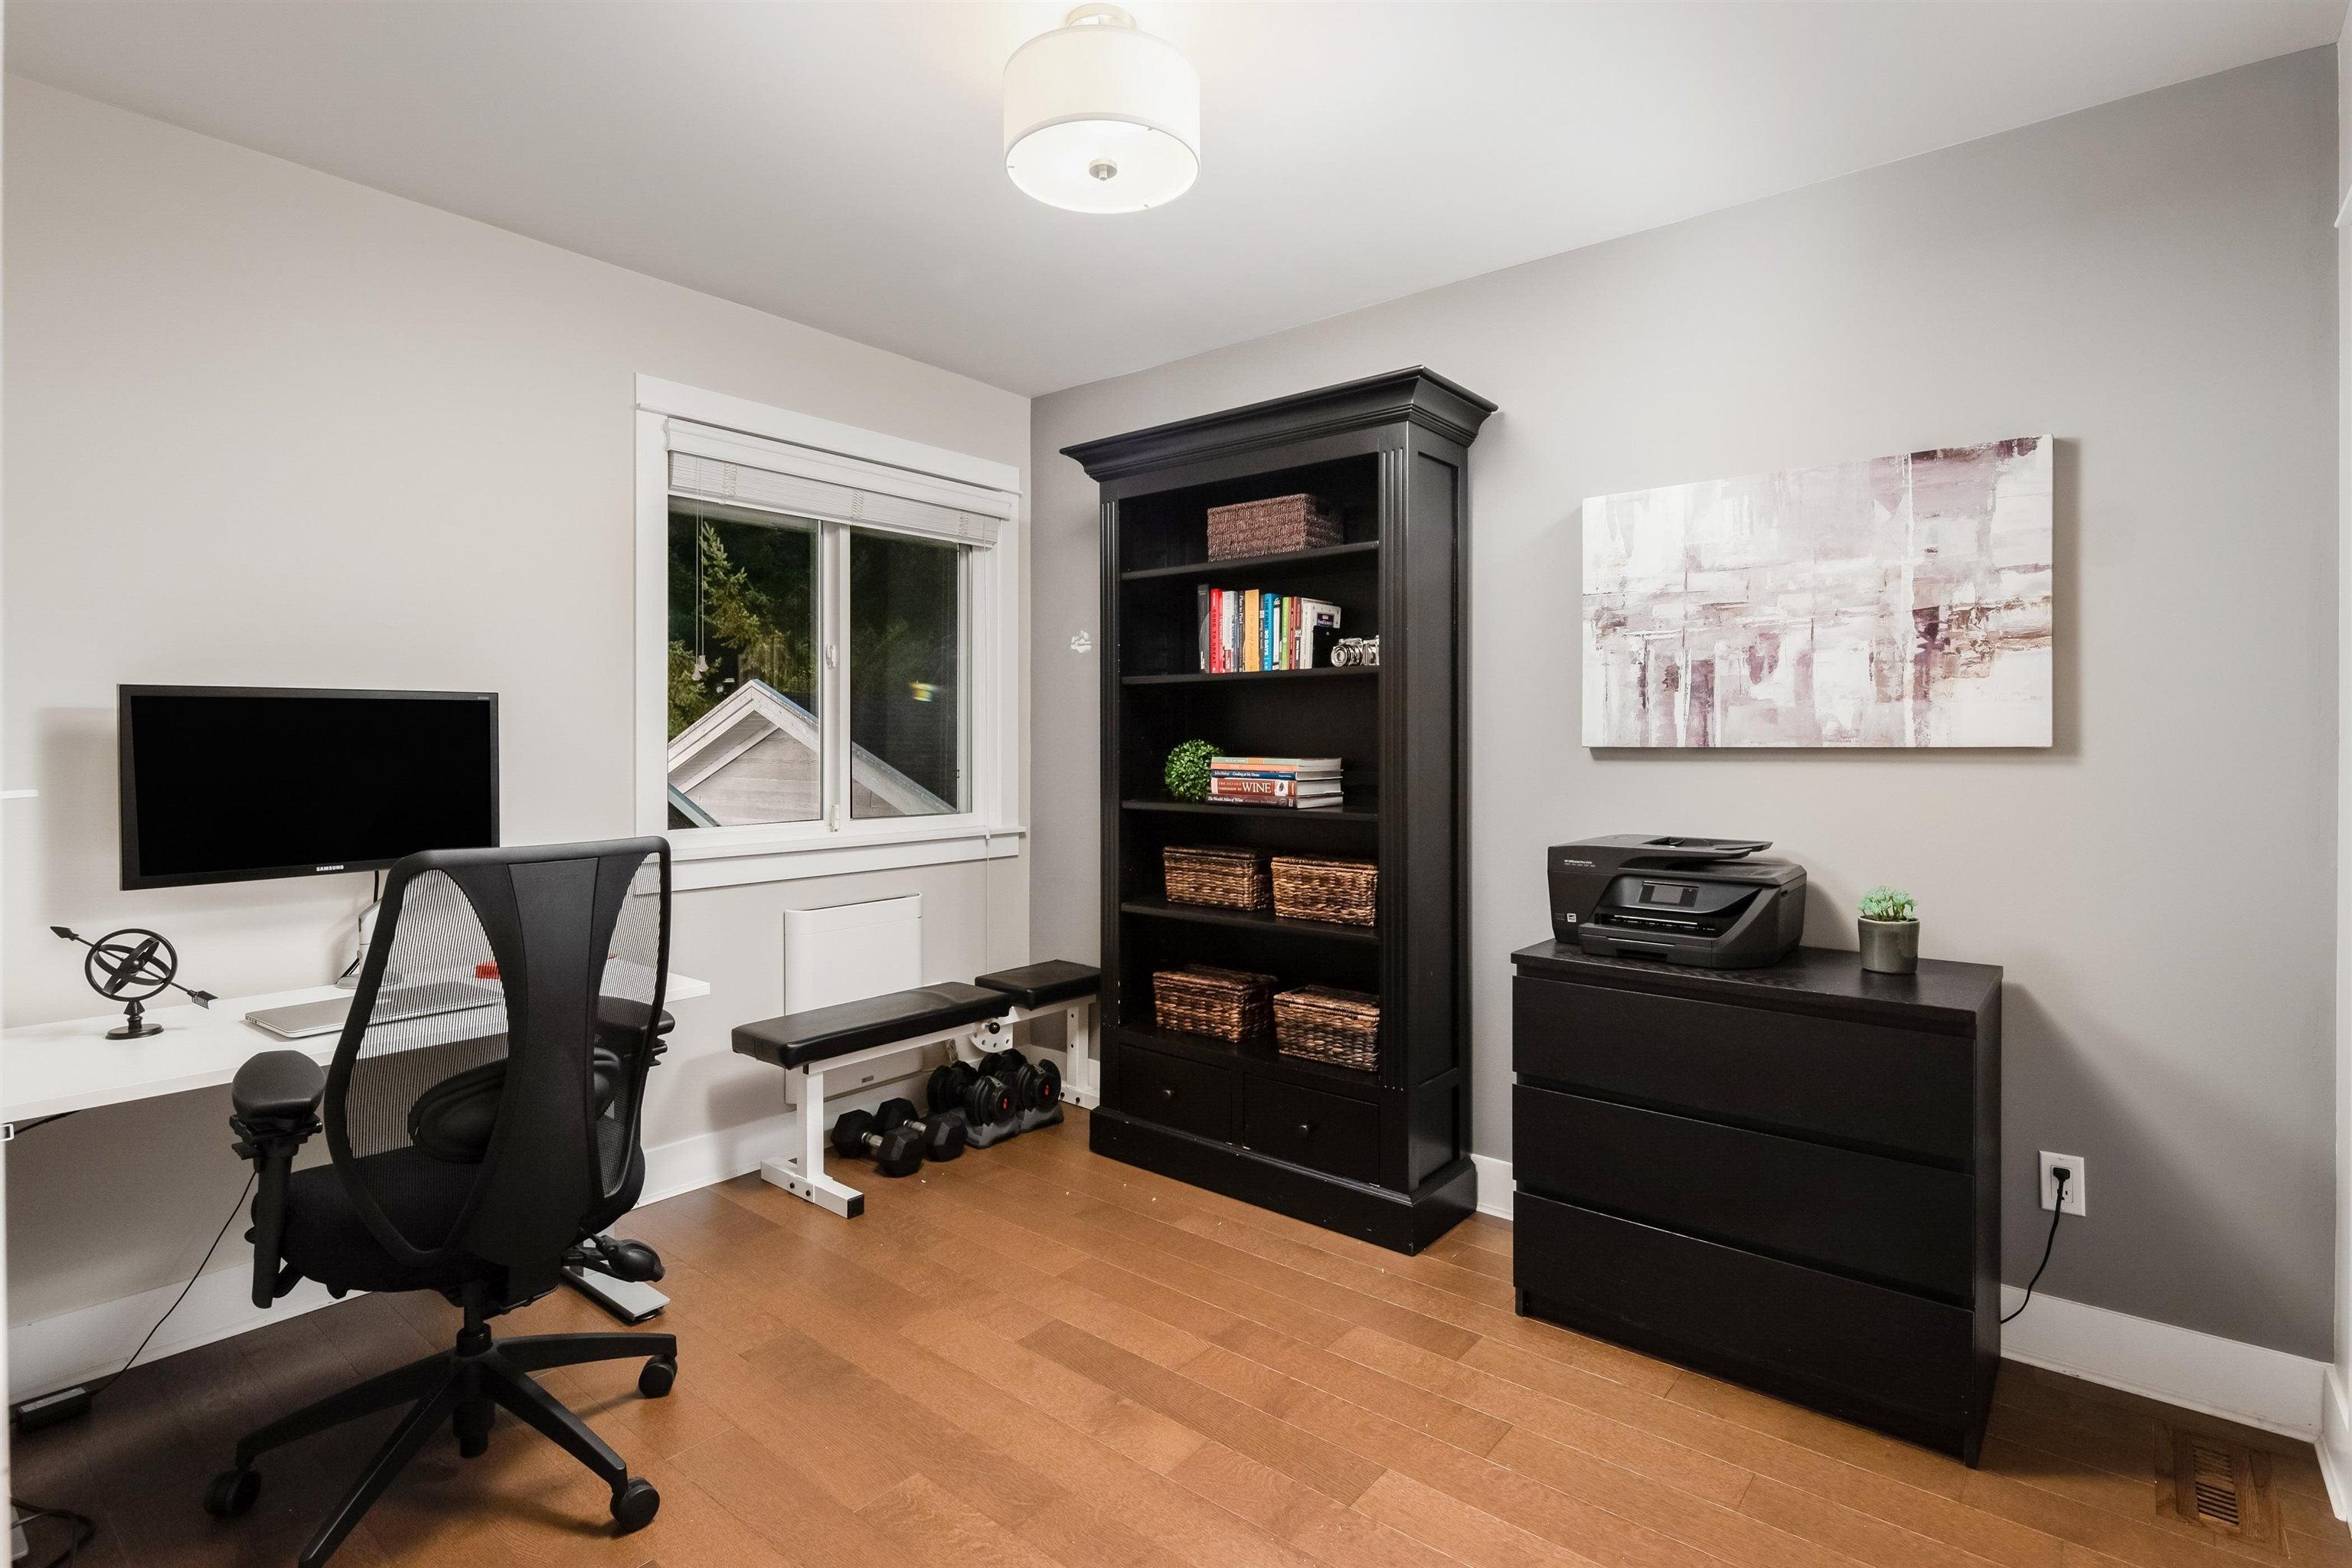 2258 WINDRIDGE DRIVE - Seymour NV House/Single Family for sale, 5 Bedrooms (R2617156) - #26